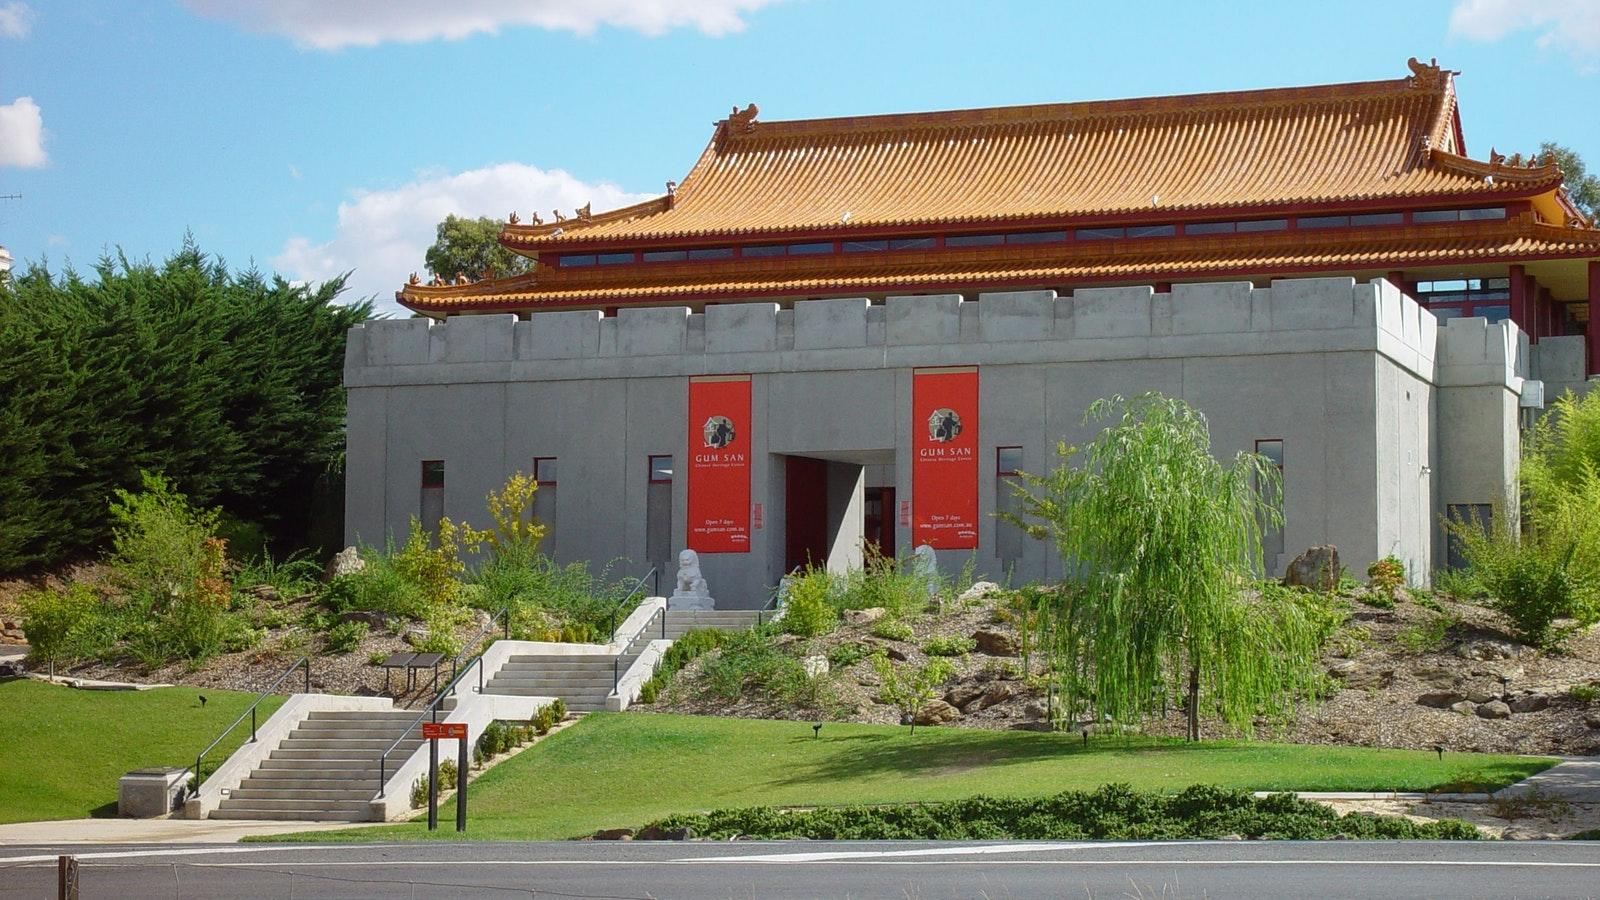 Gum San Chinese Heritage Centre